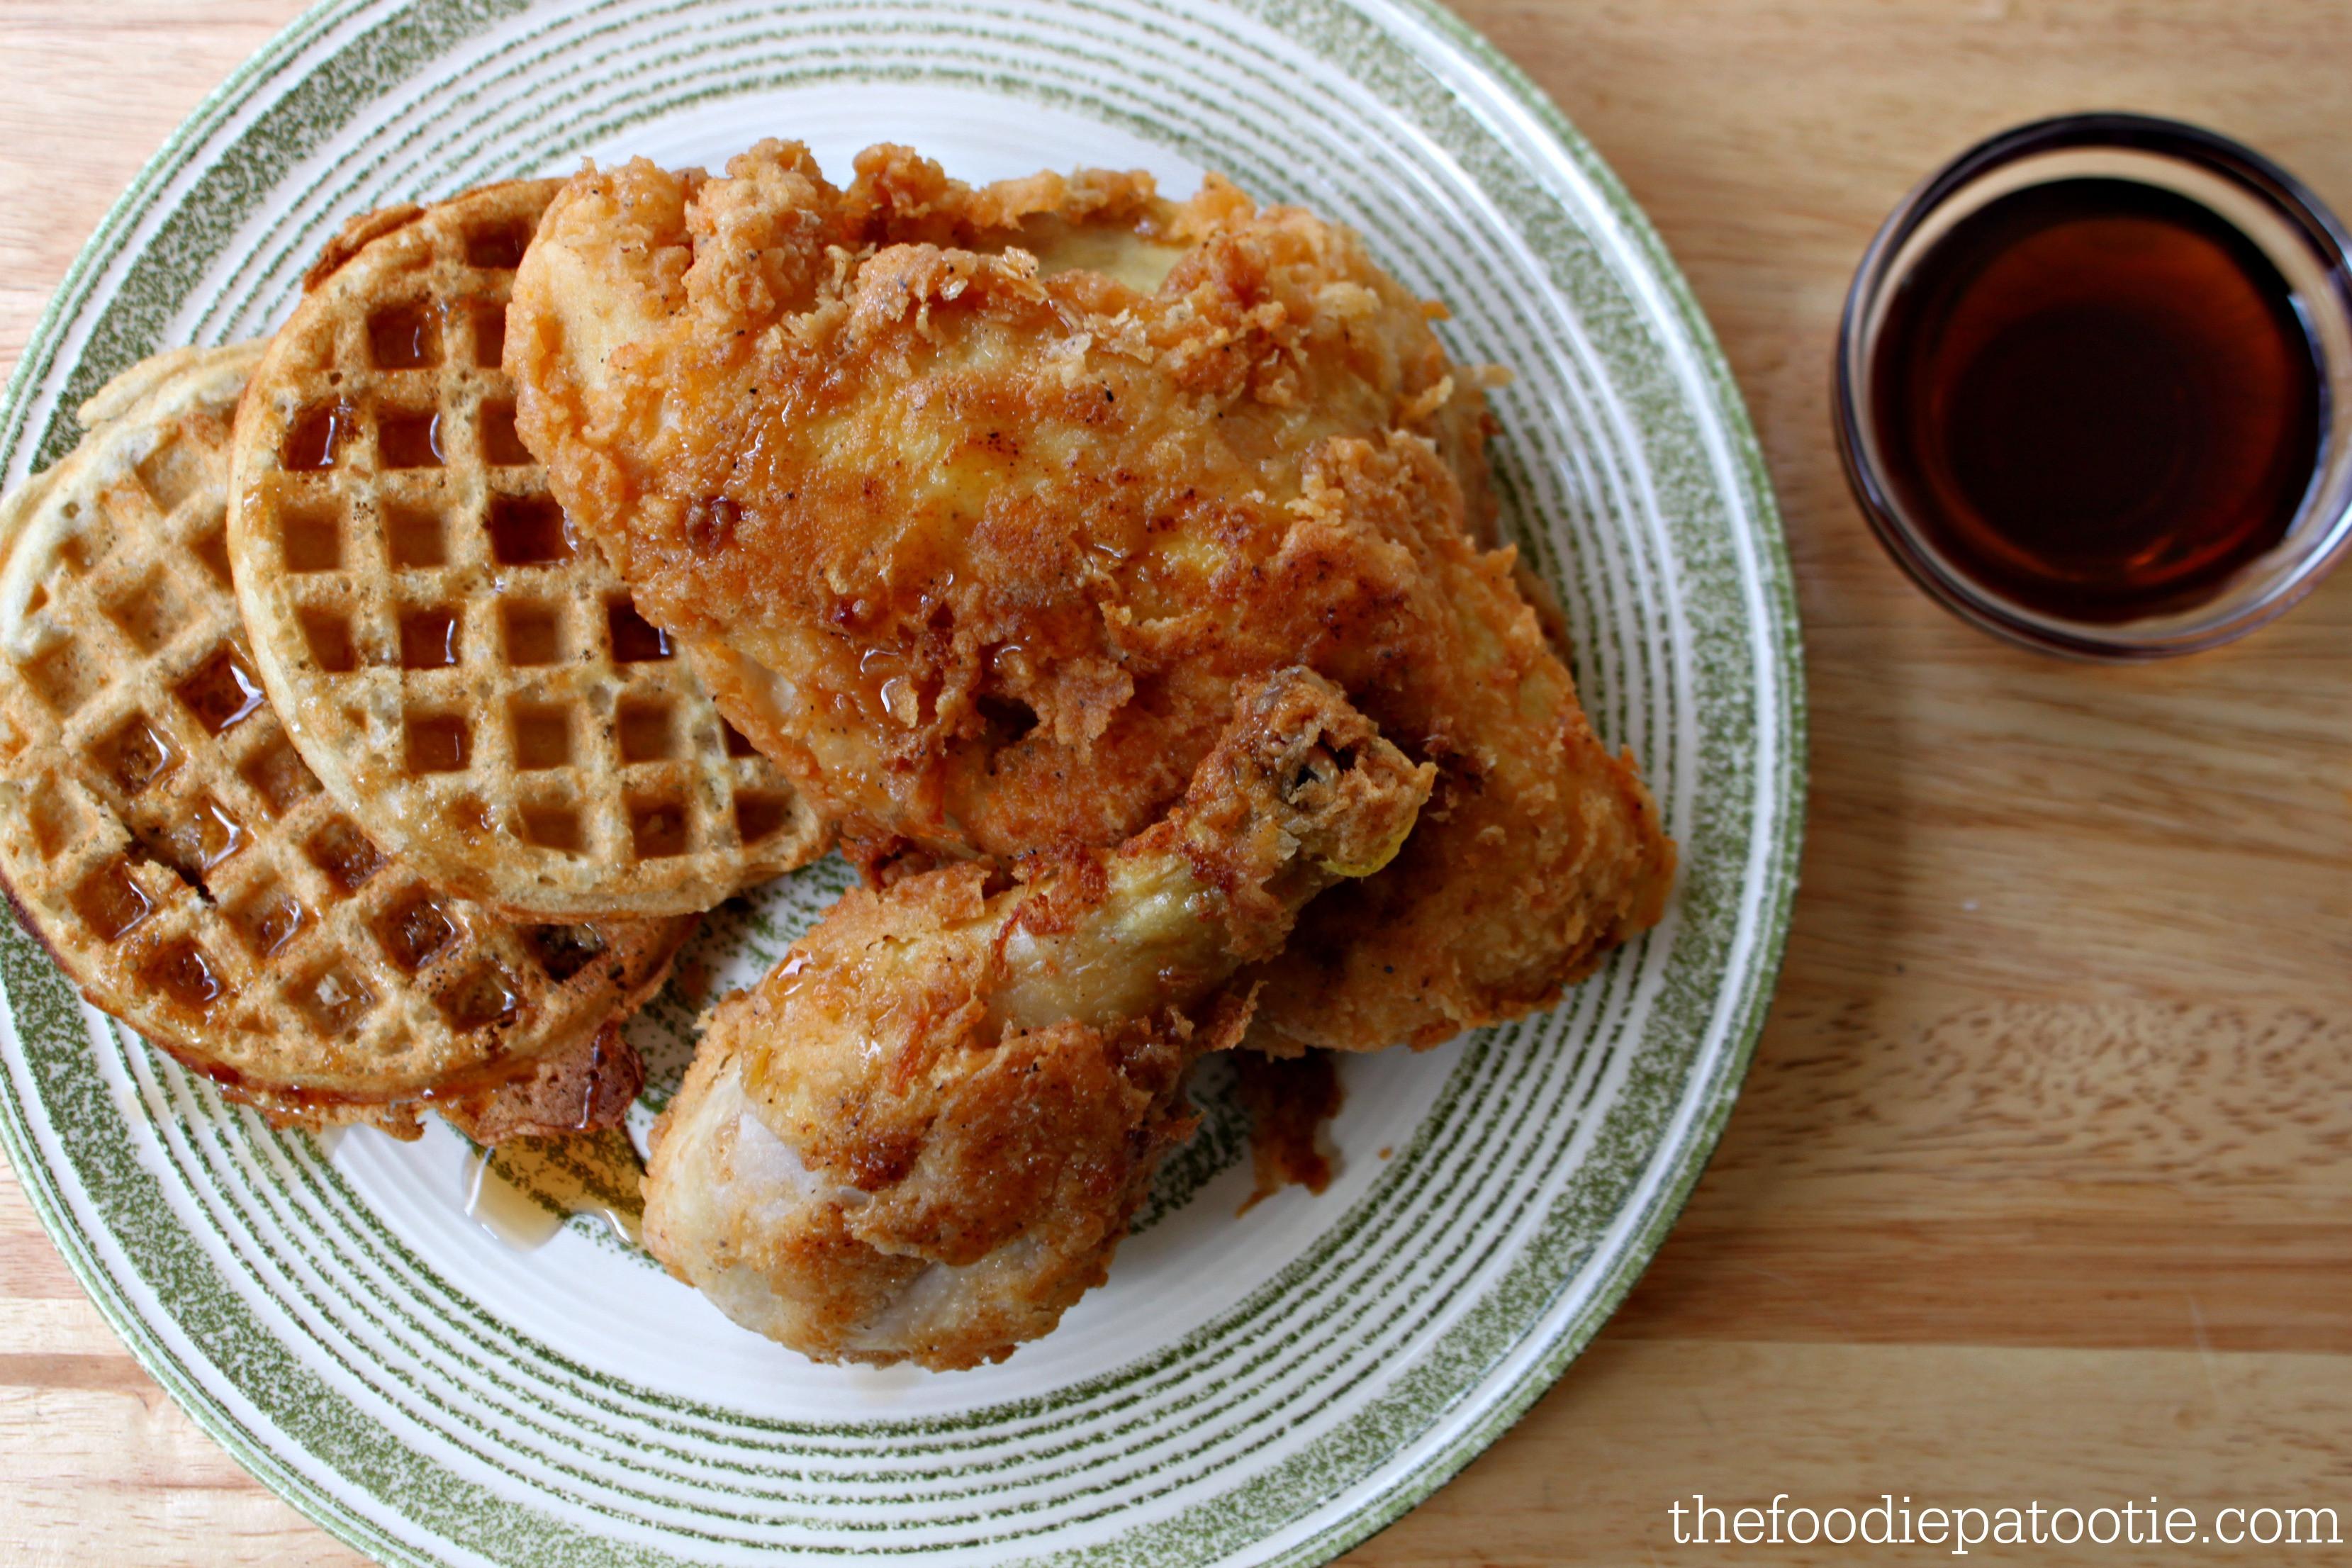 Kfc Chicken And Waffles  National Waffle Day